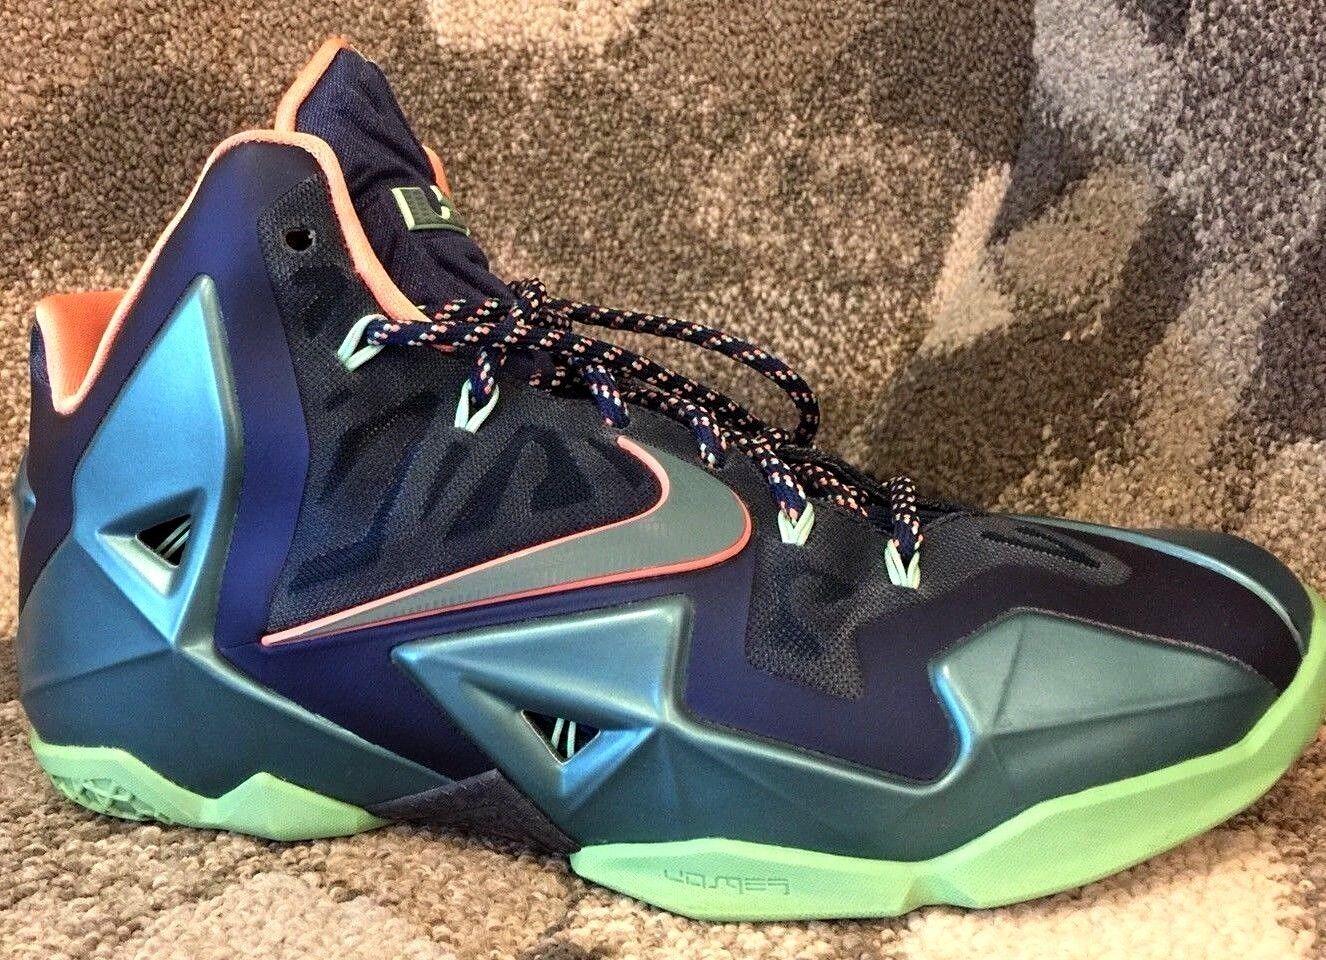 Nike Lebron XI Akron vs. Miami Brave Blue/Mineral Teal Size 9 CLEAN! 616175-400